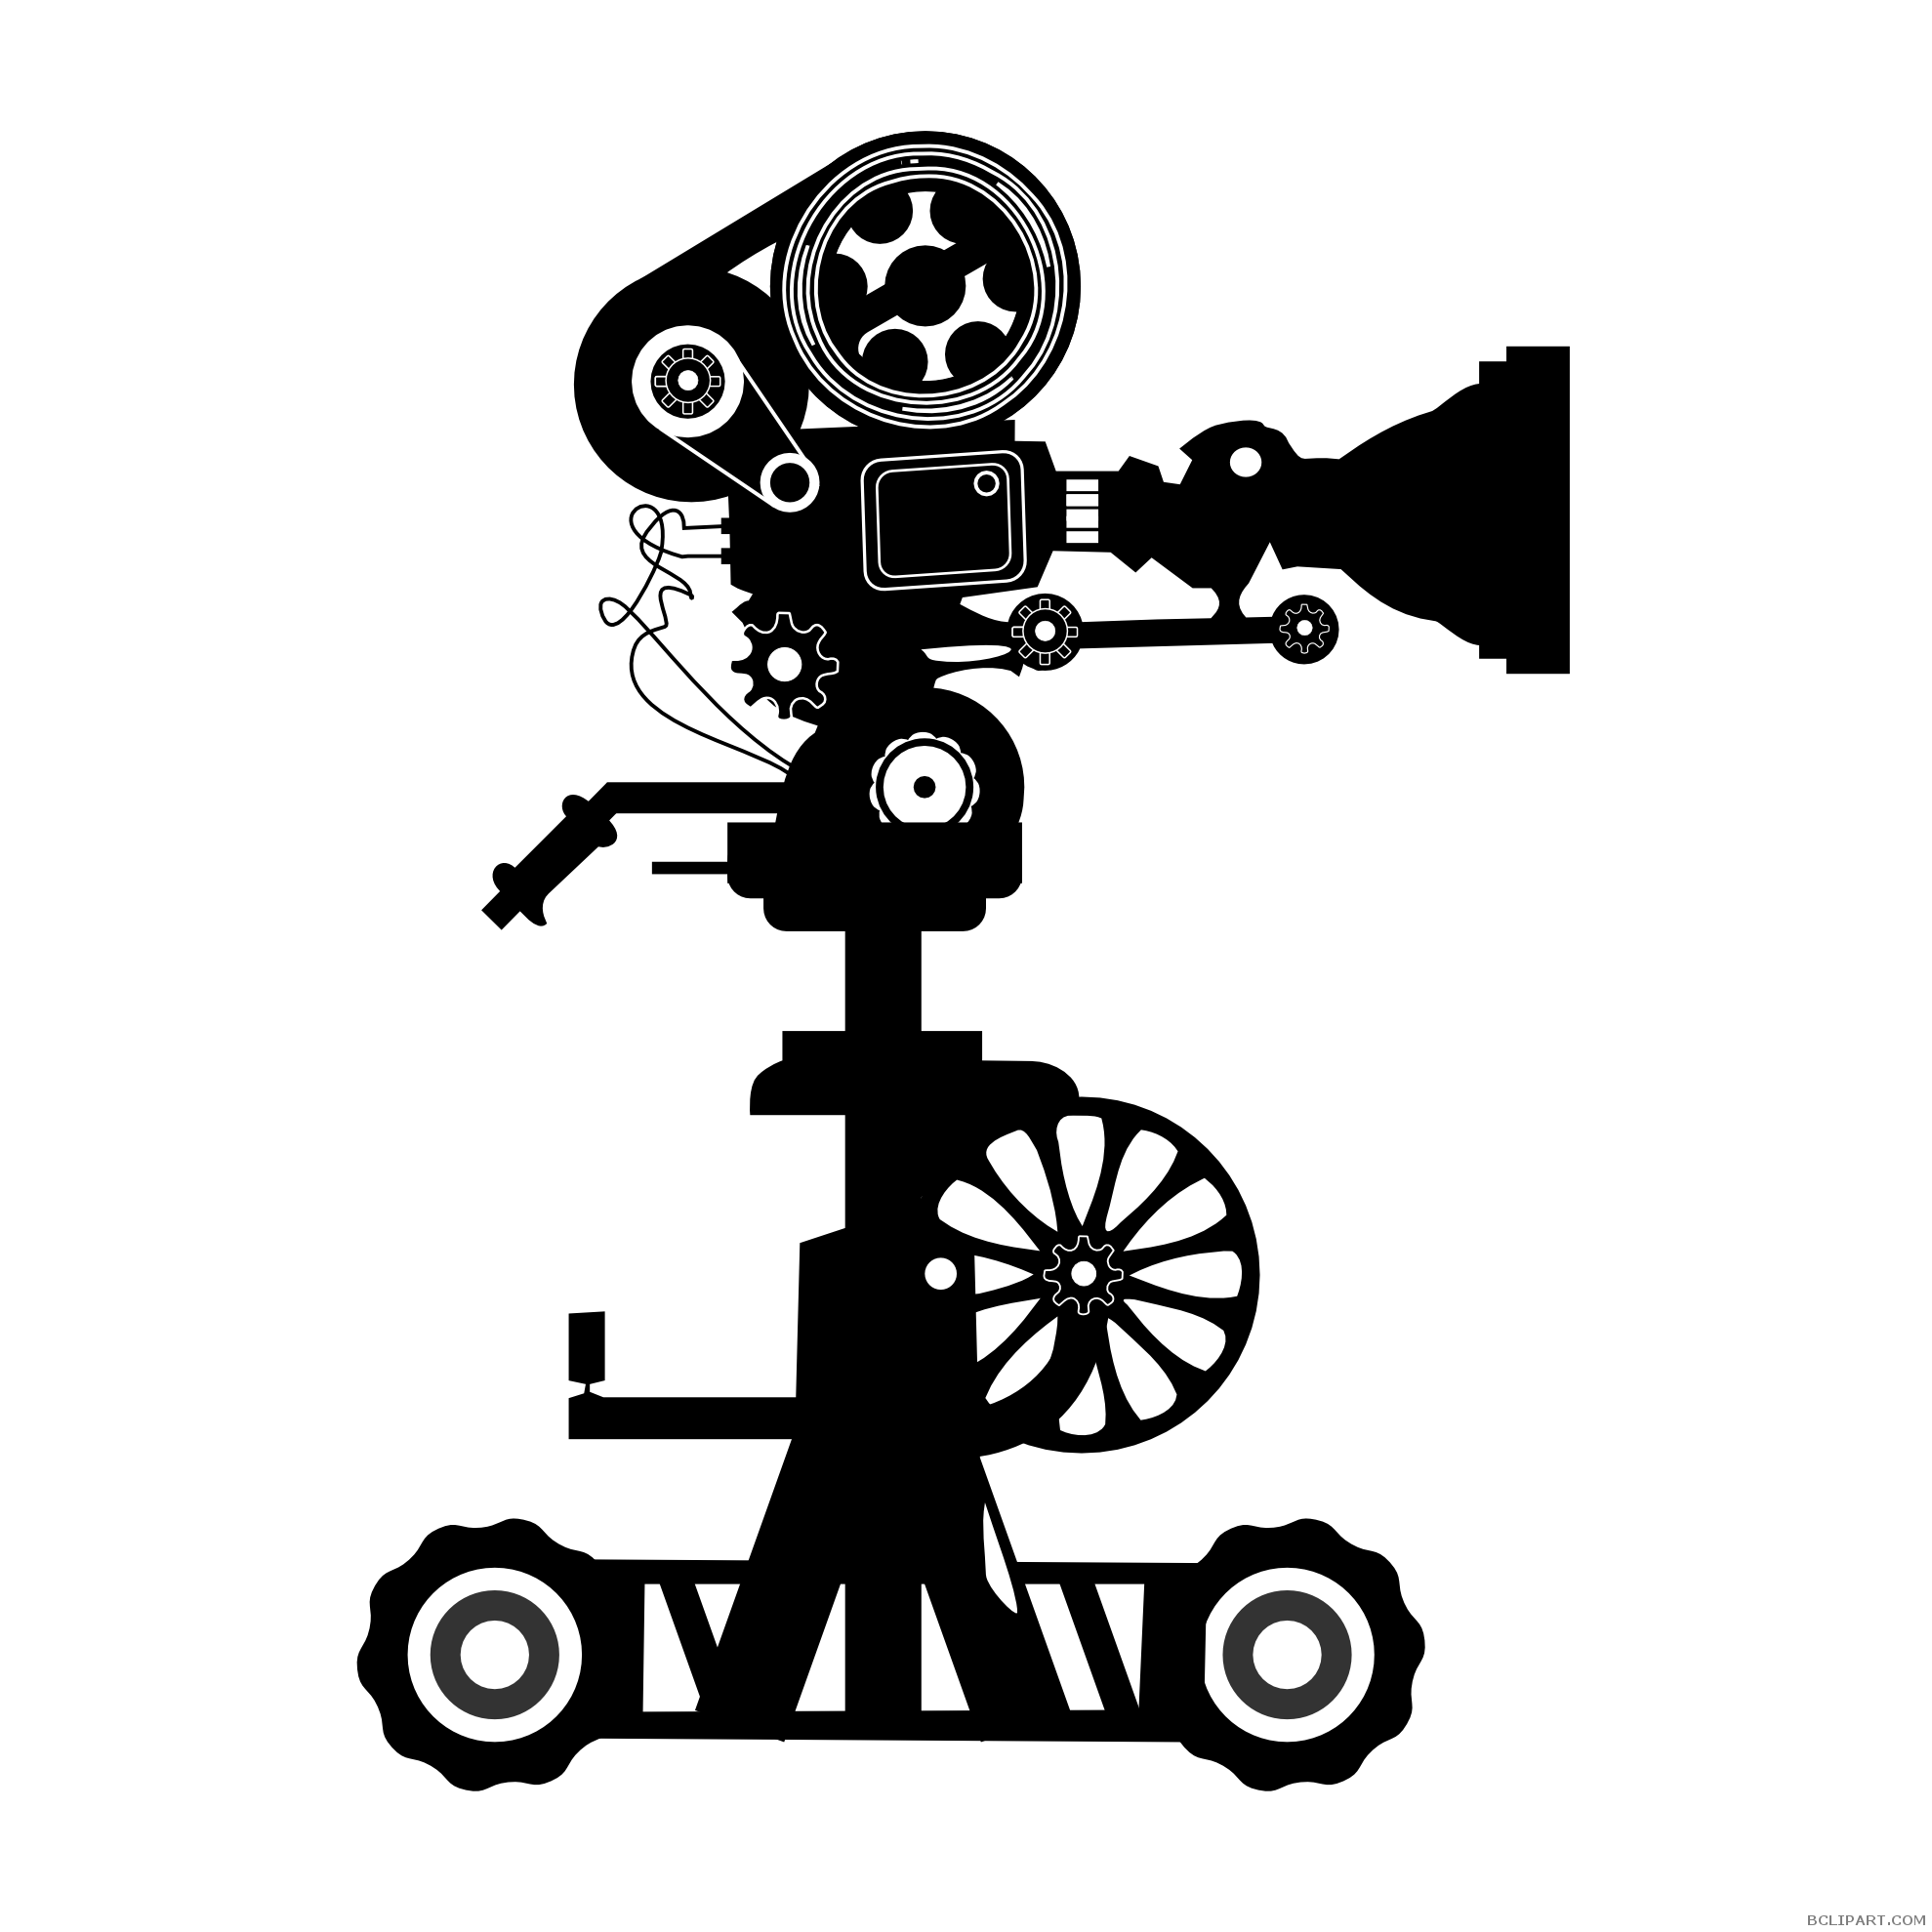 clipart black and white Movie Camera Silhouette Clipart